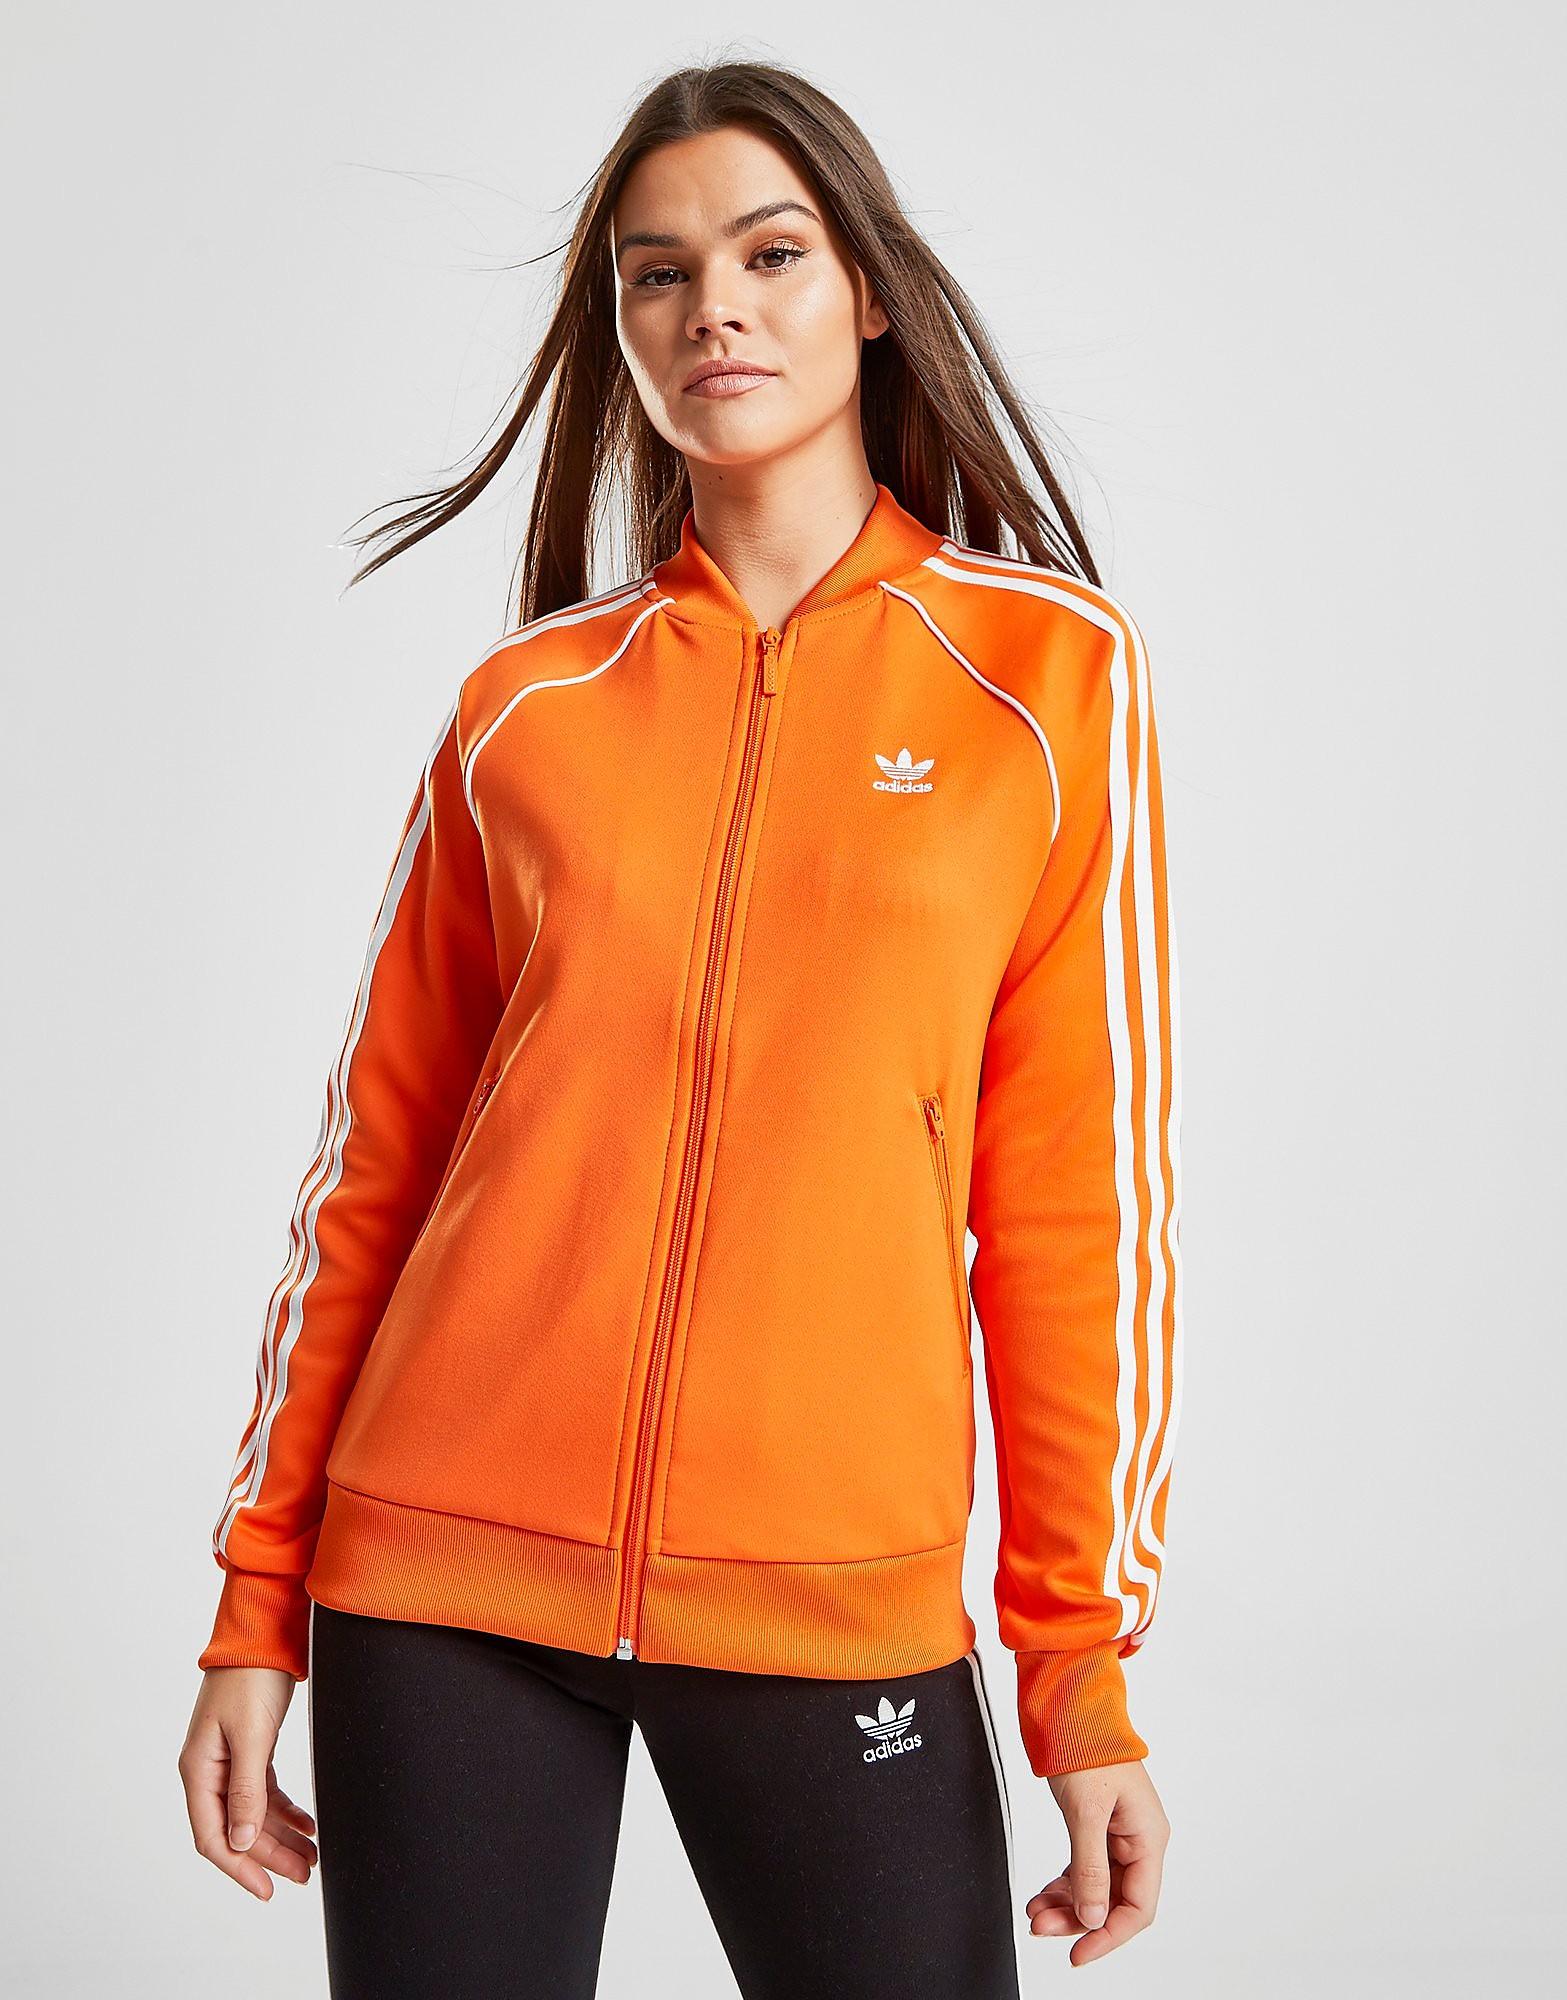 adidas Originals Superstar Track Top Dames - Oranje - Dames